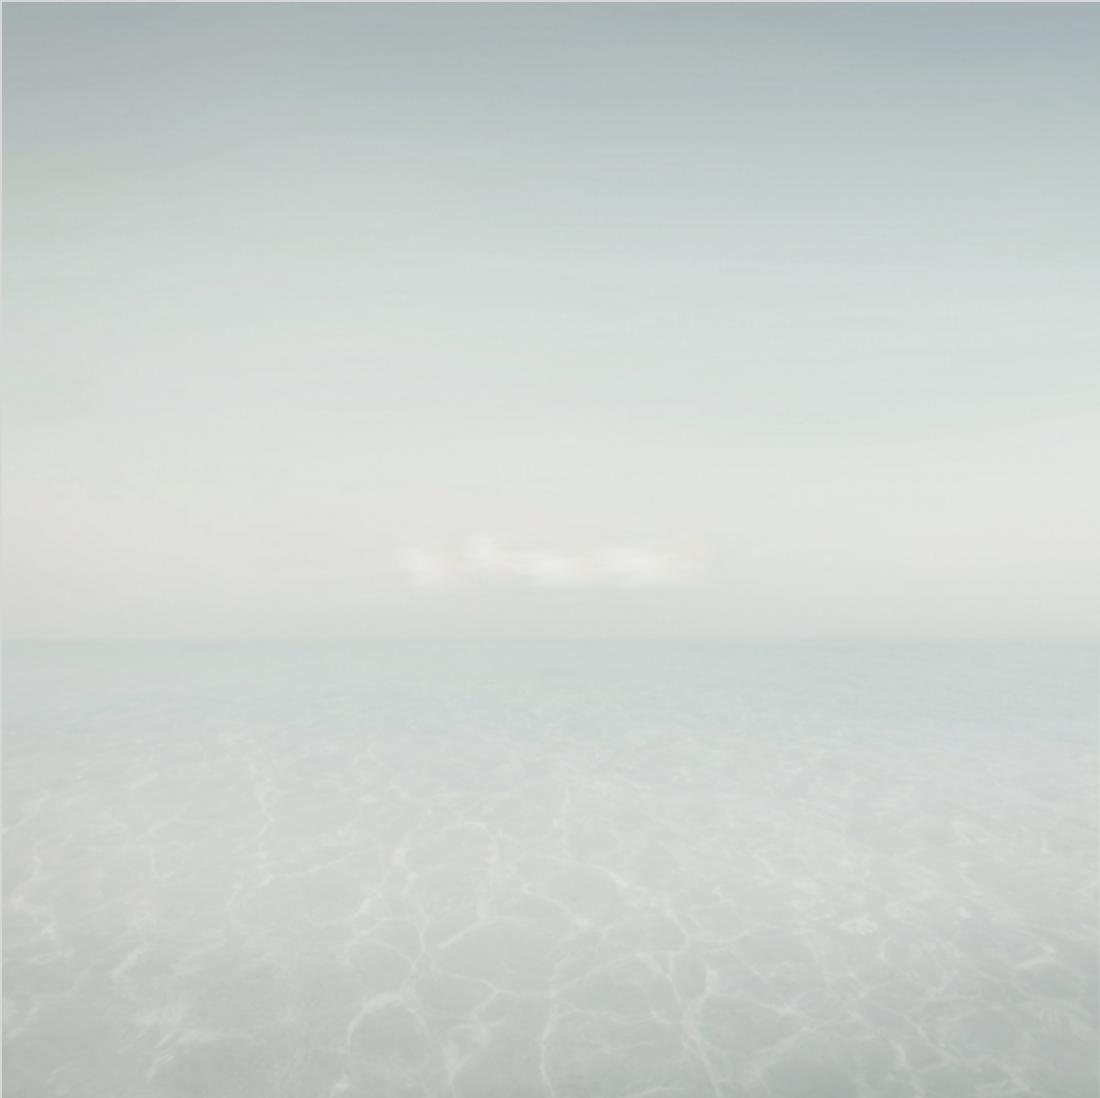 Grey Calm by Nadia Attura